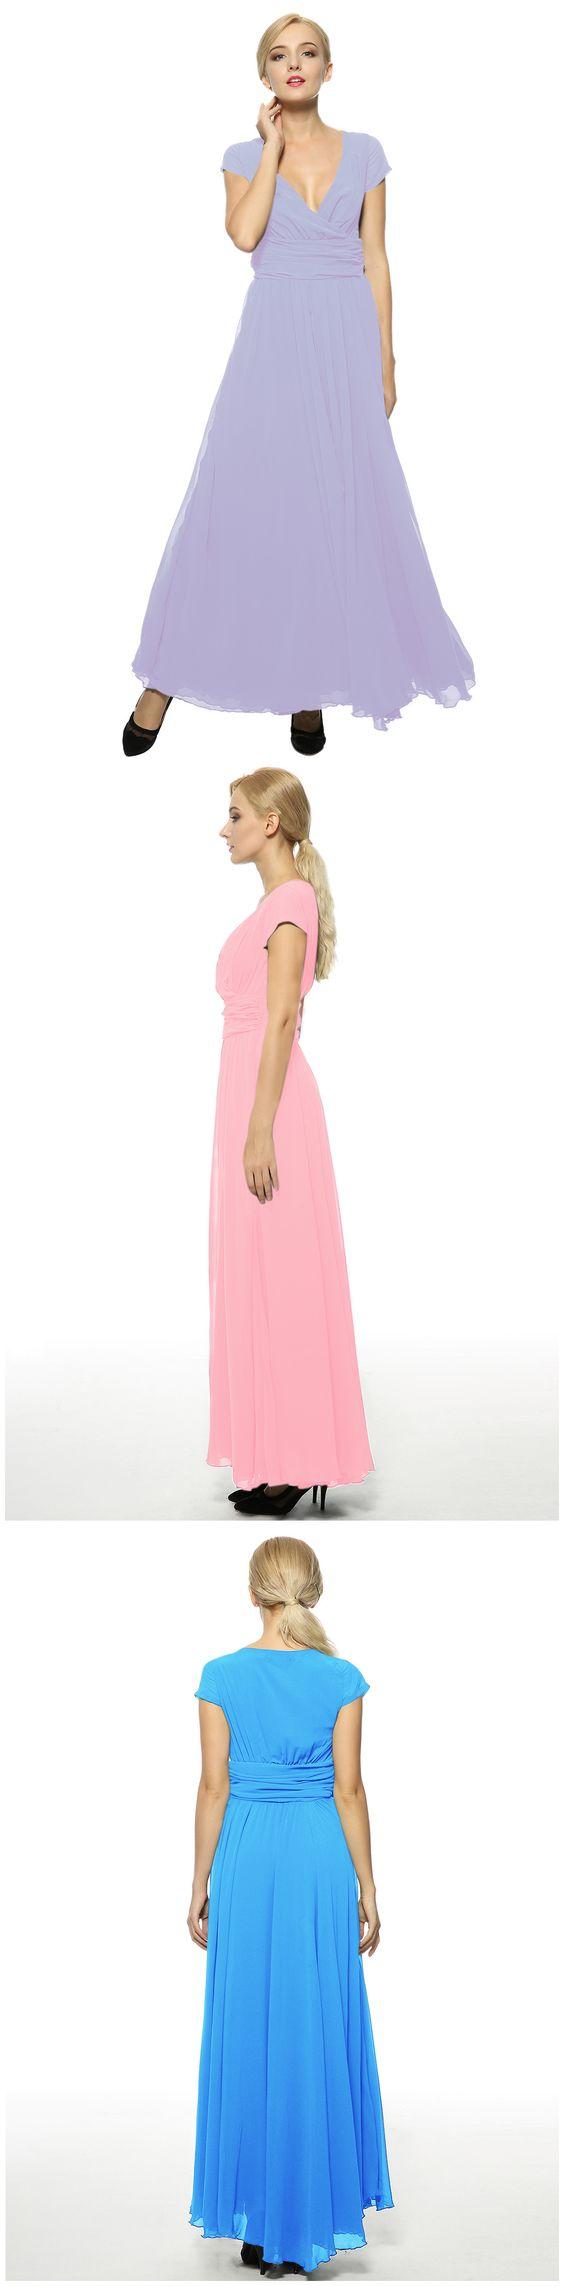 Elegant Surplice V Neckline Maxi Chiffon Dress